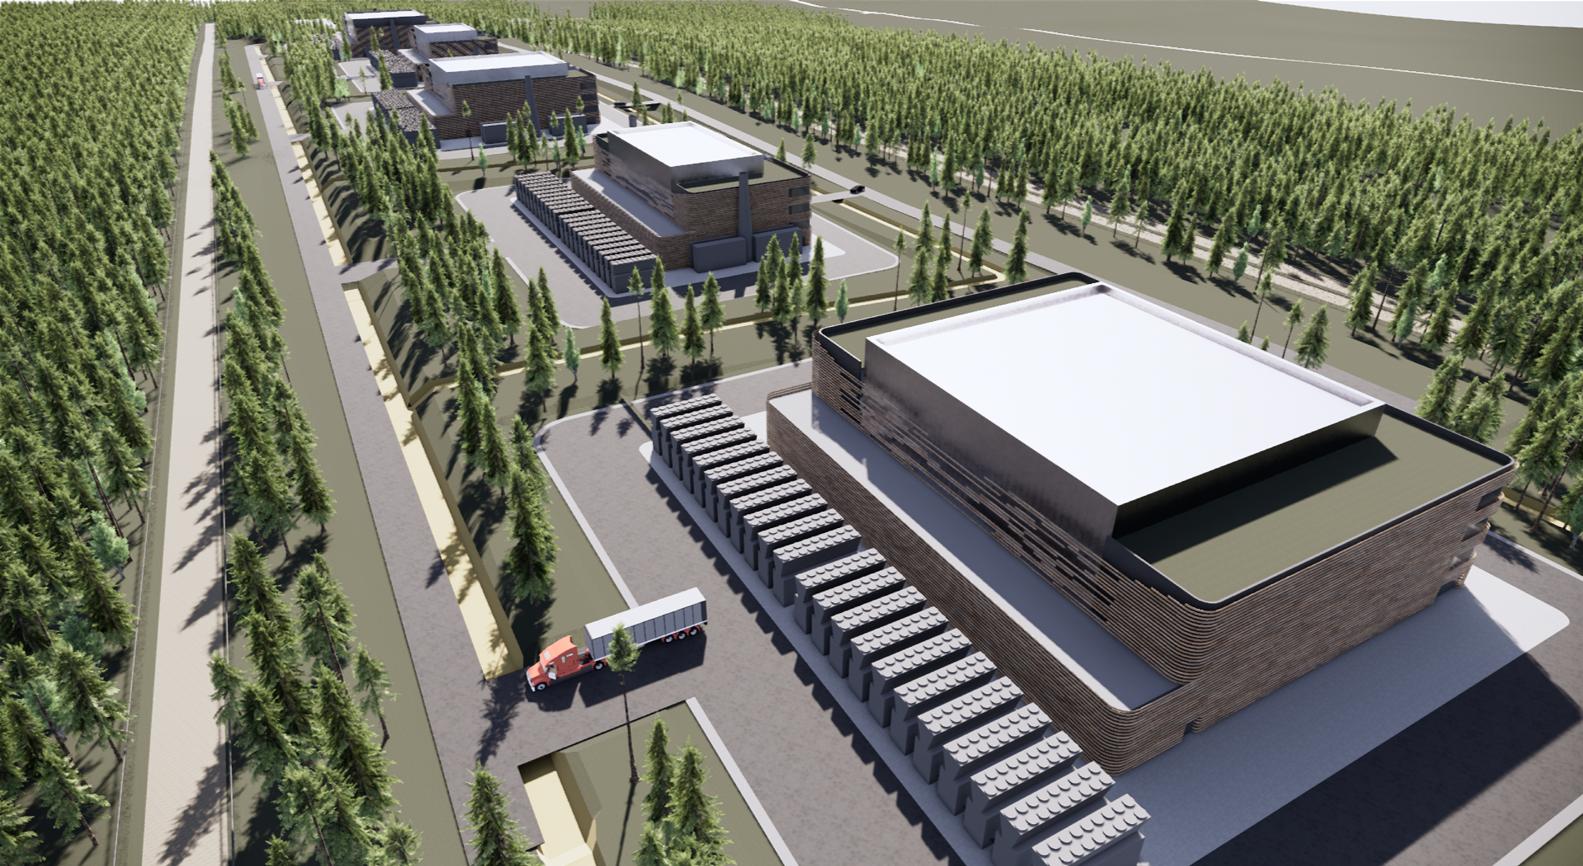 NDC to build 100% green data center in joint venture with Skellefteå Kraft